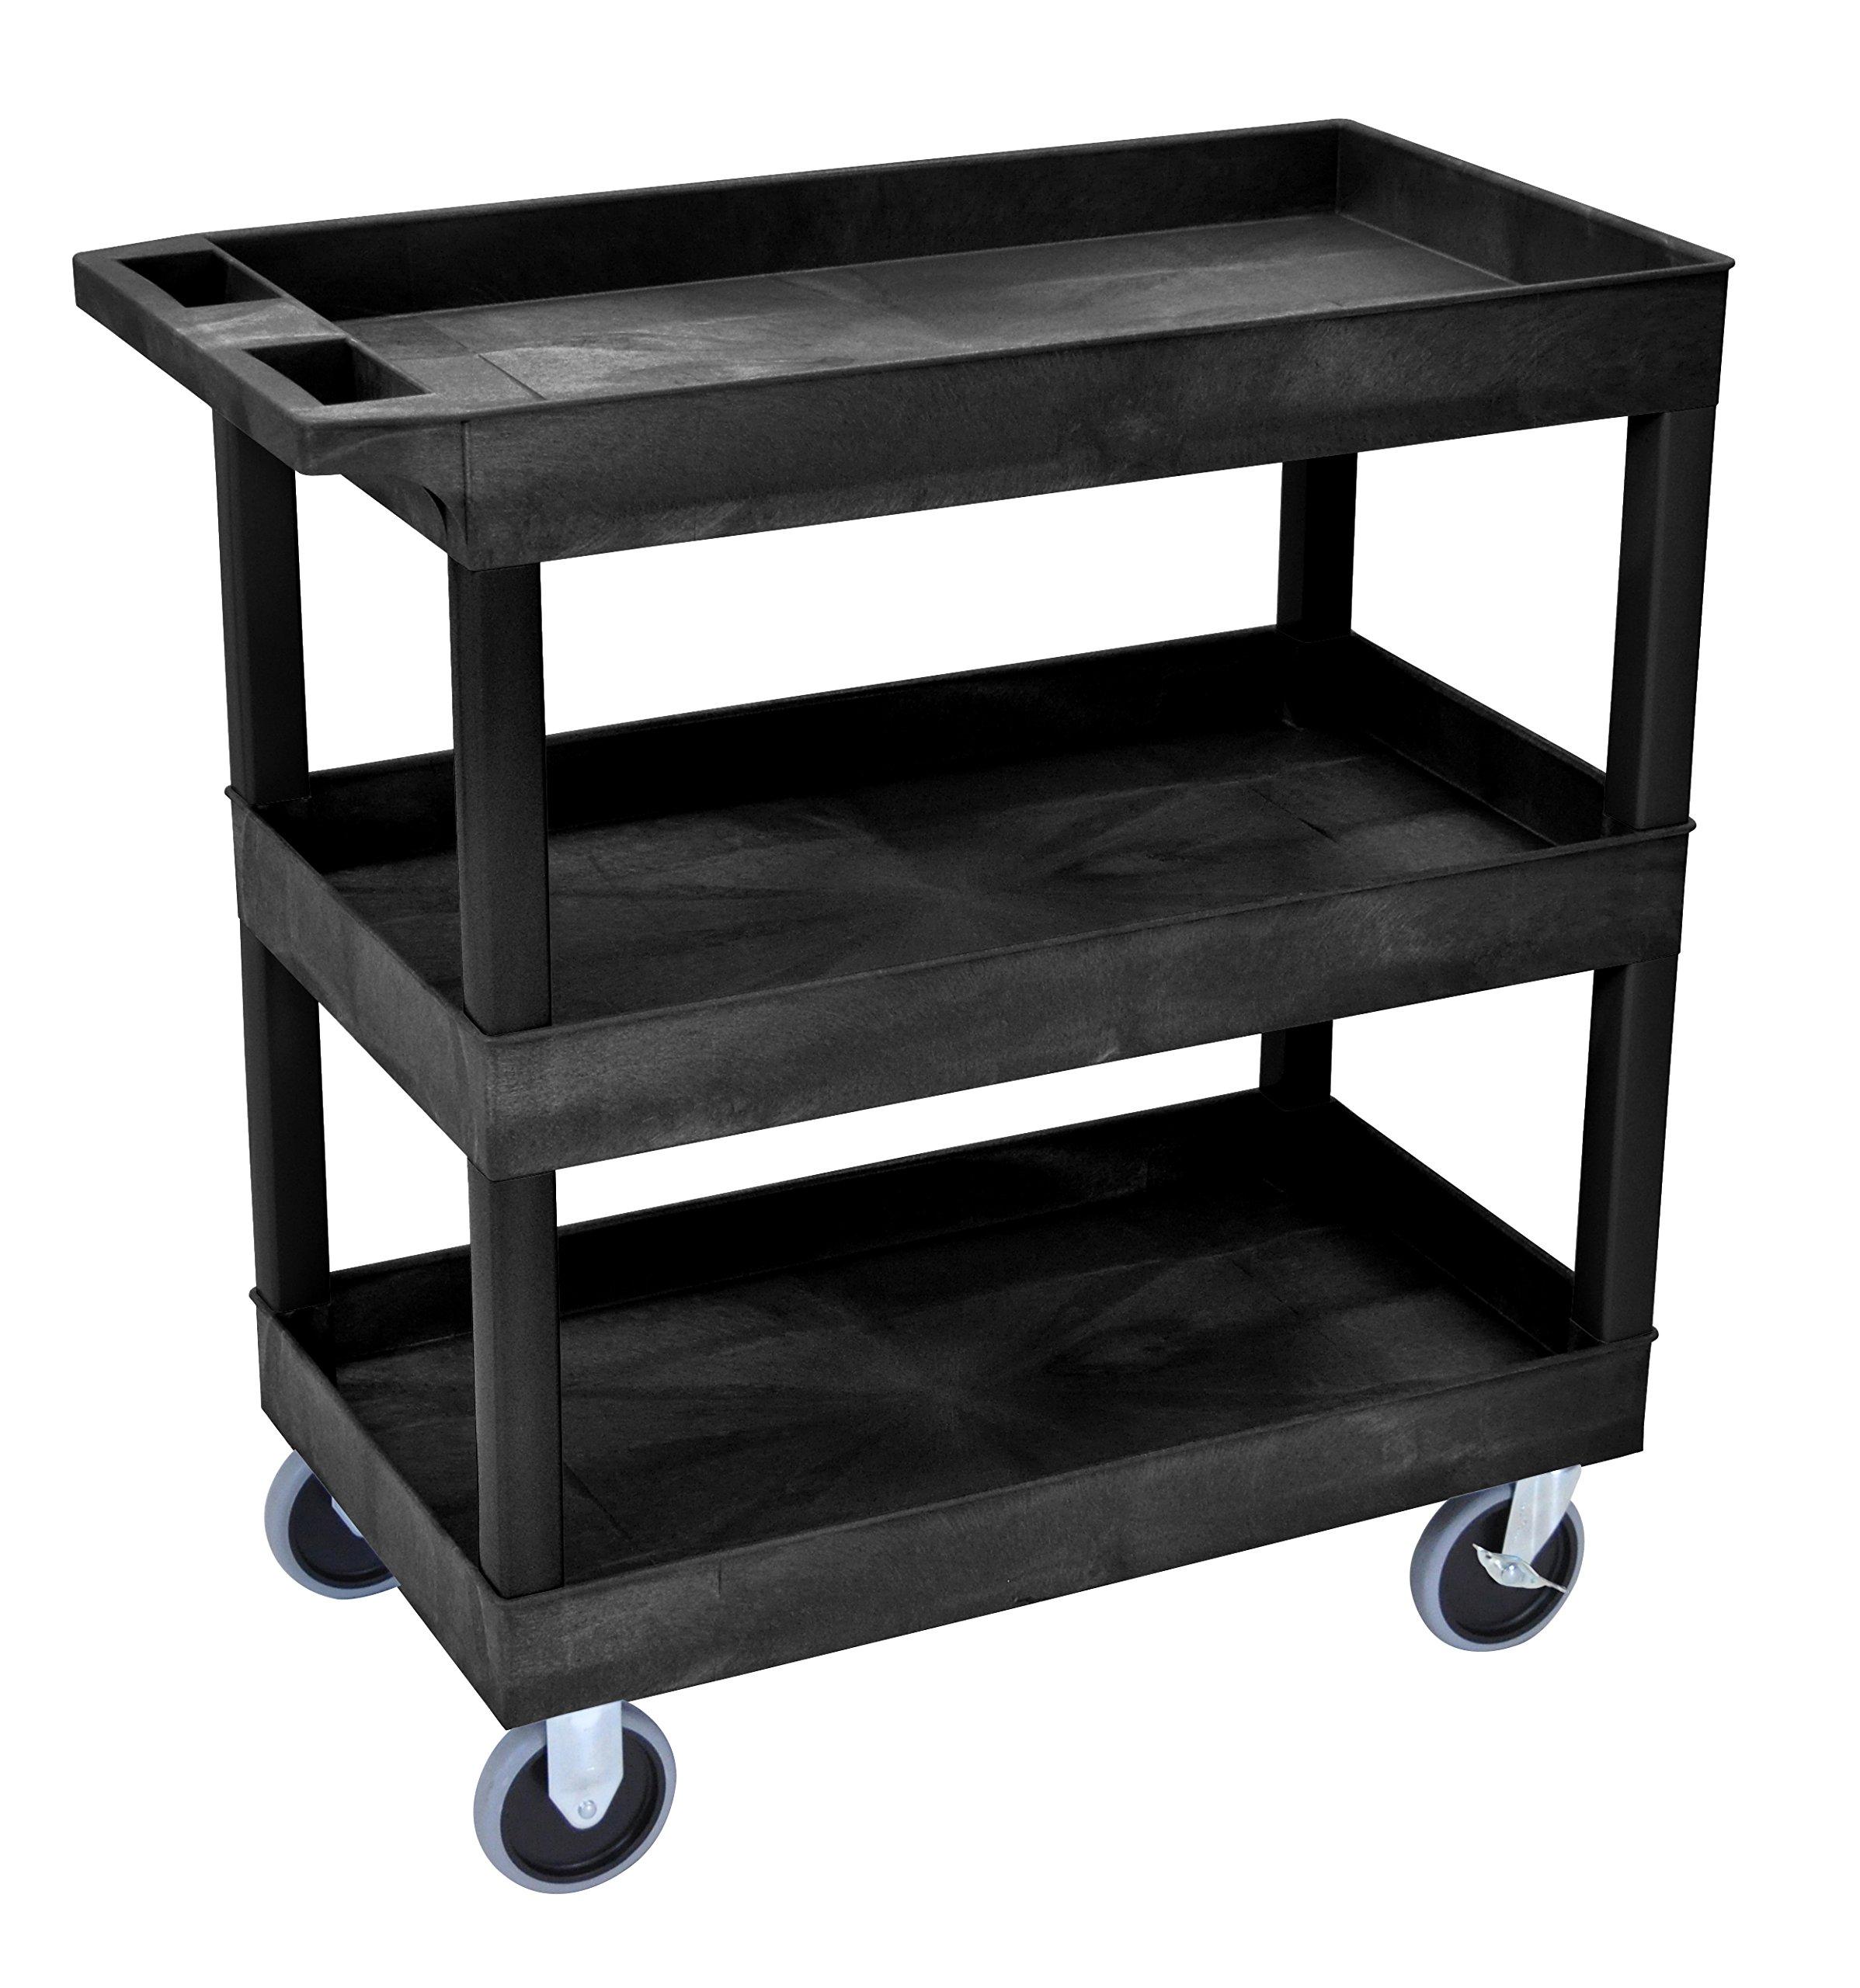 LUXOR EC111HD-B HD High Capacity Cart, 3 Tub Shelves, Black by Luxor